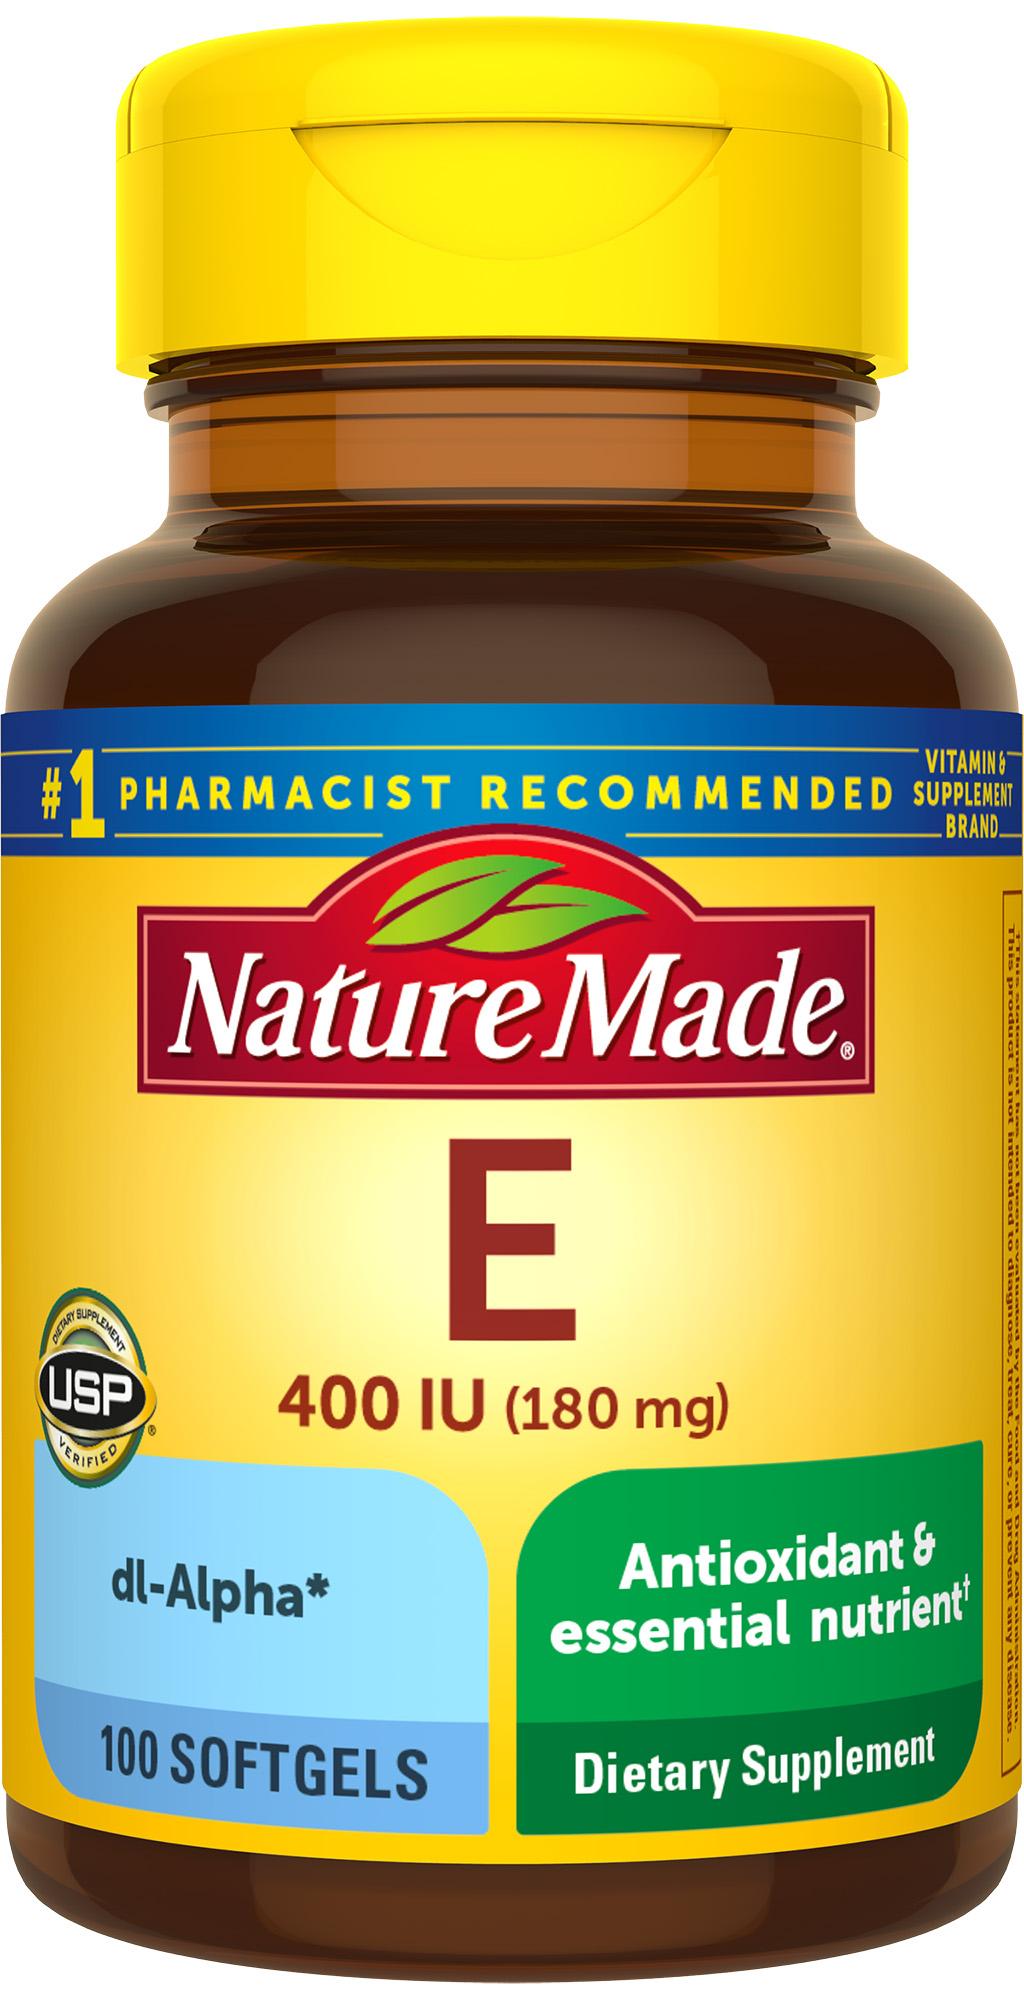 nature-made-vitamin-e